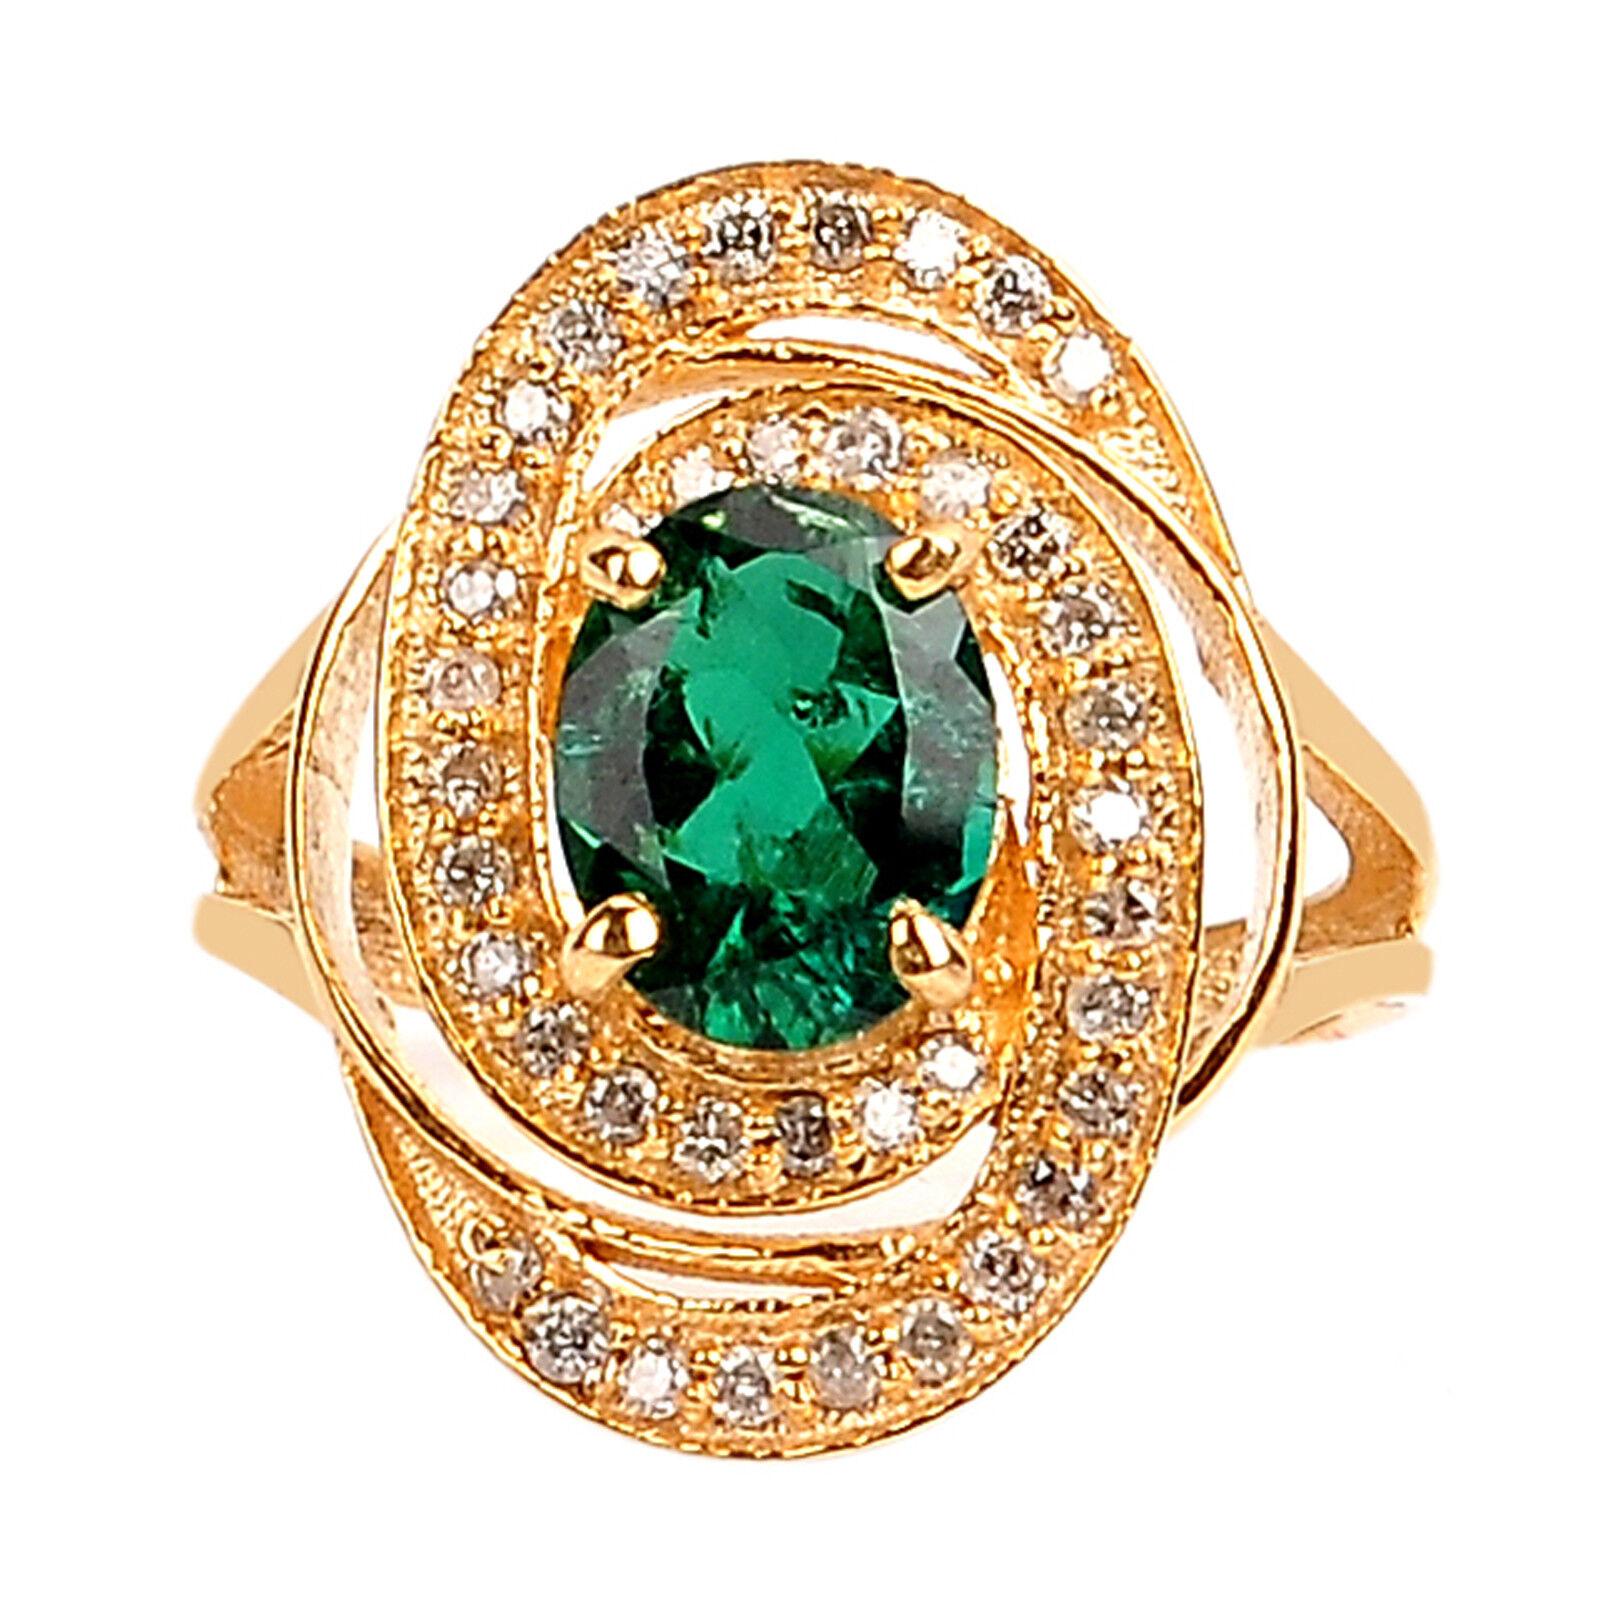 14KT Yellow gold 1.50 Carat Natural Green Emerald EGL Certified Diamond Ring